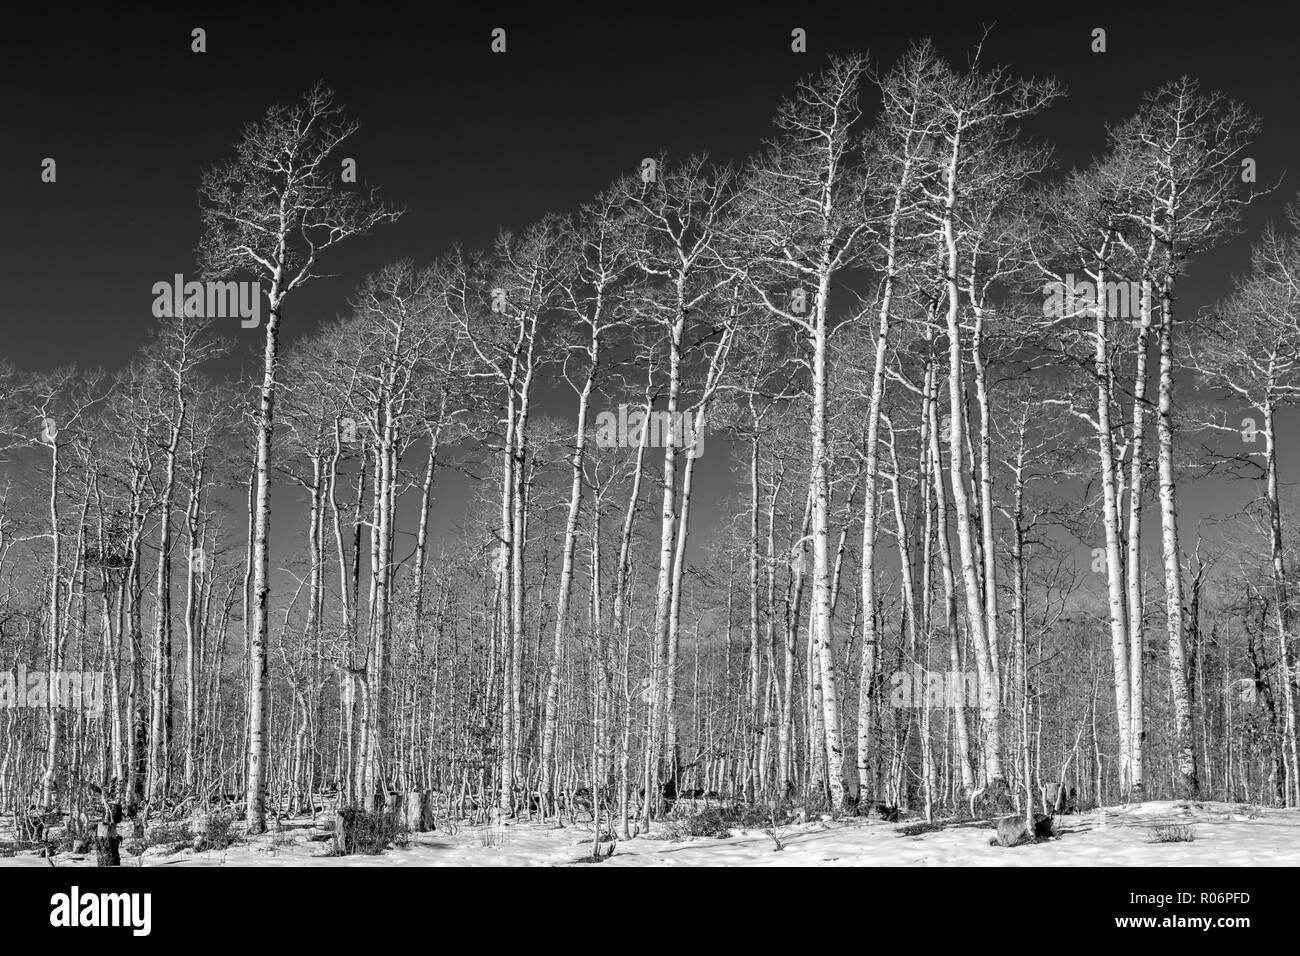 Winter Aspen - Southern Utah Mountains - Stock Image